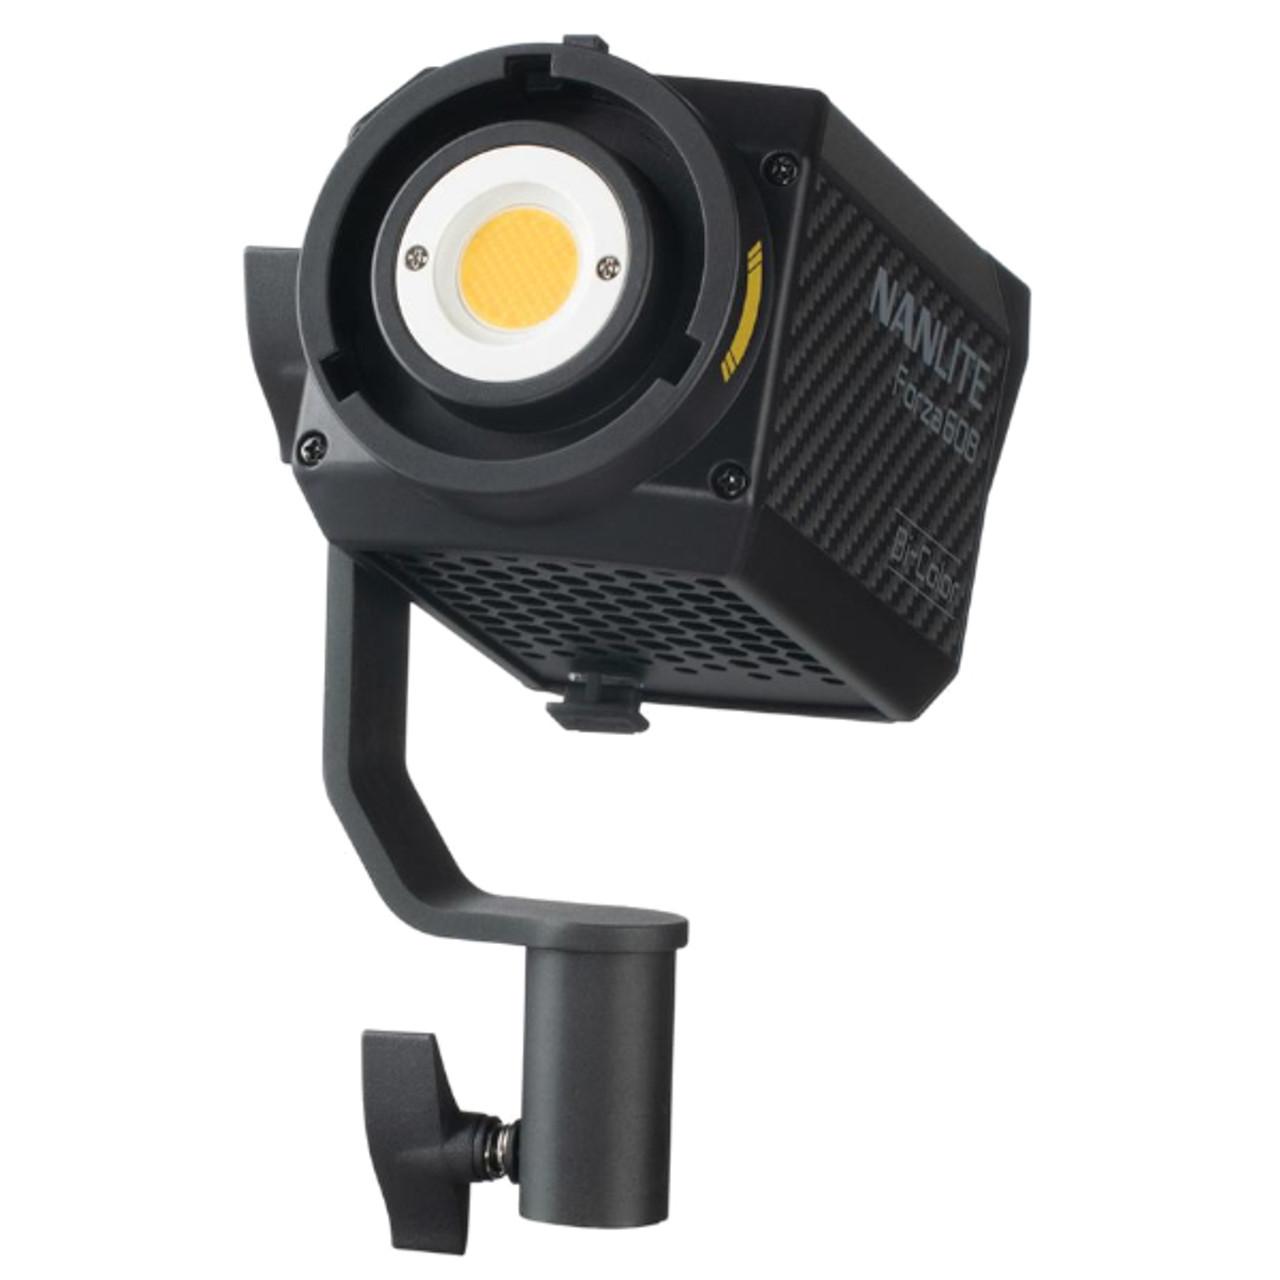 Nanlite Forza 60B Bicolor LED Monolight